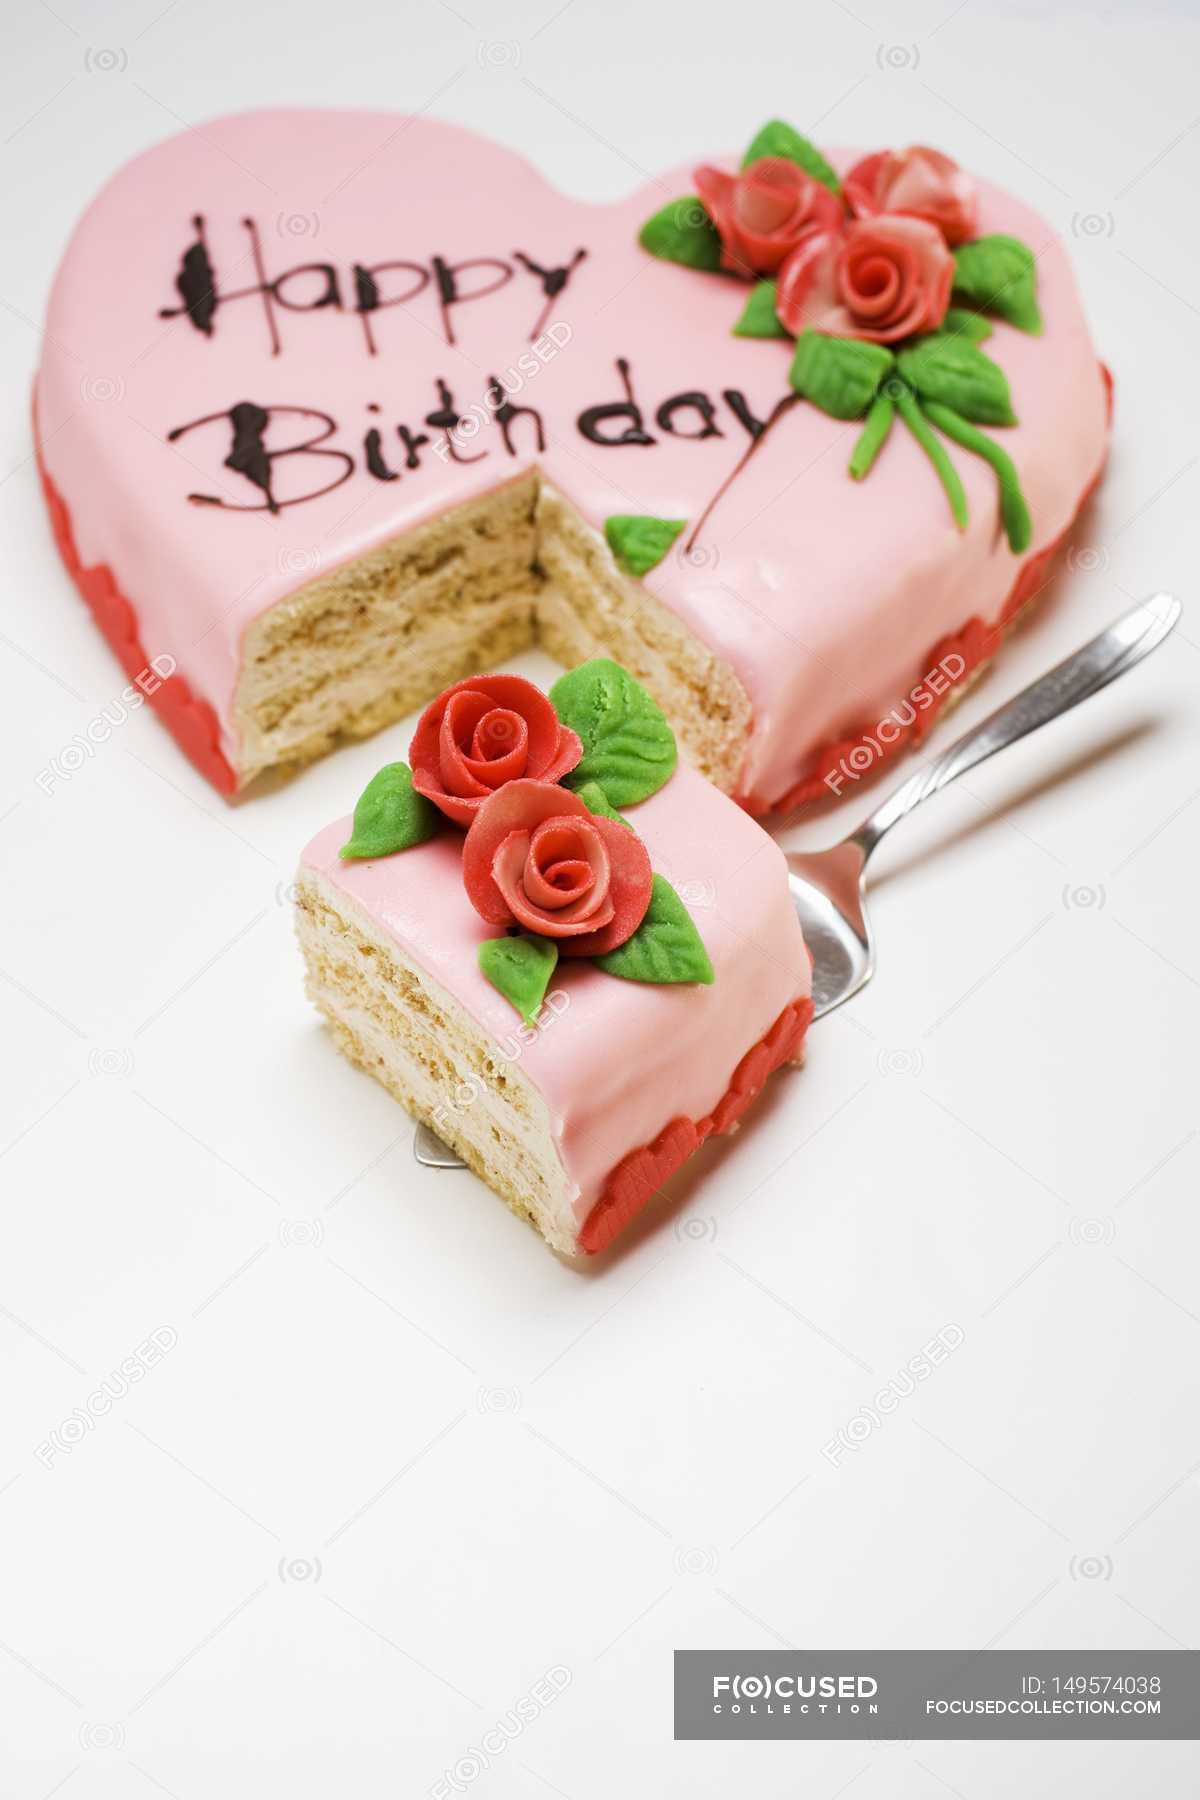 Wondrous Pink Heart Shaped Birthday Cake Food Recipe Stock Photo Funny Birthday Cards Online Fluifree Goldxyz